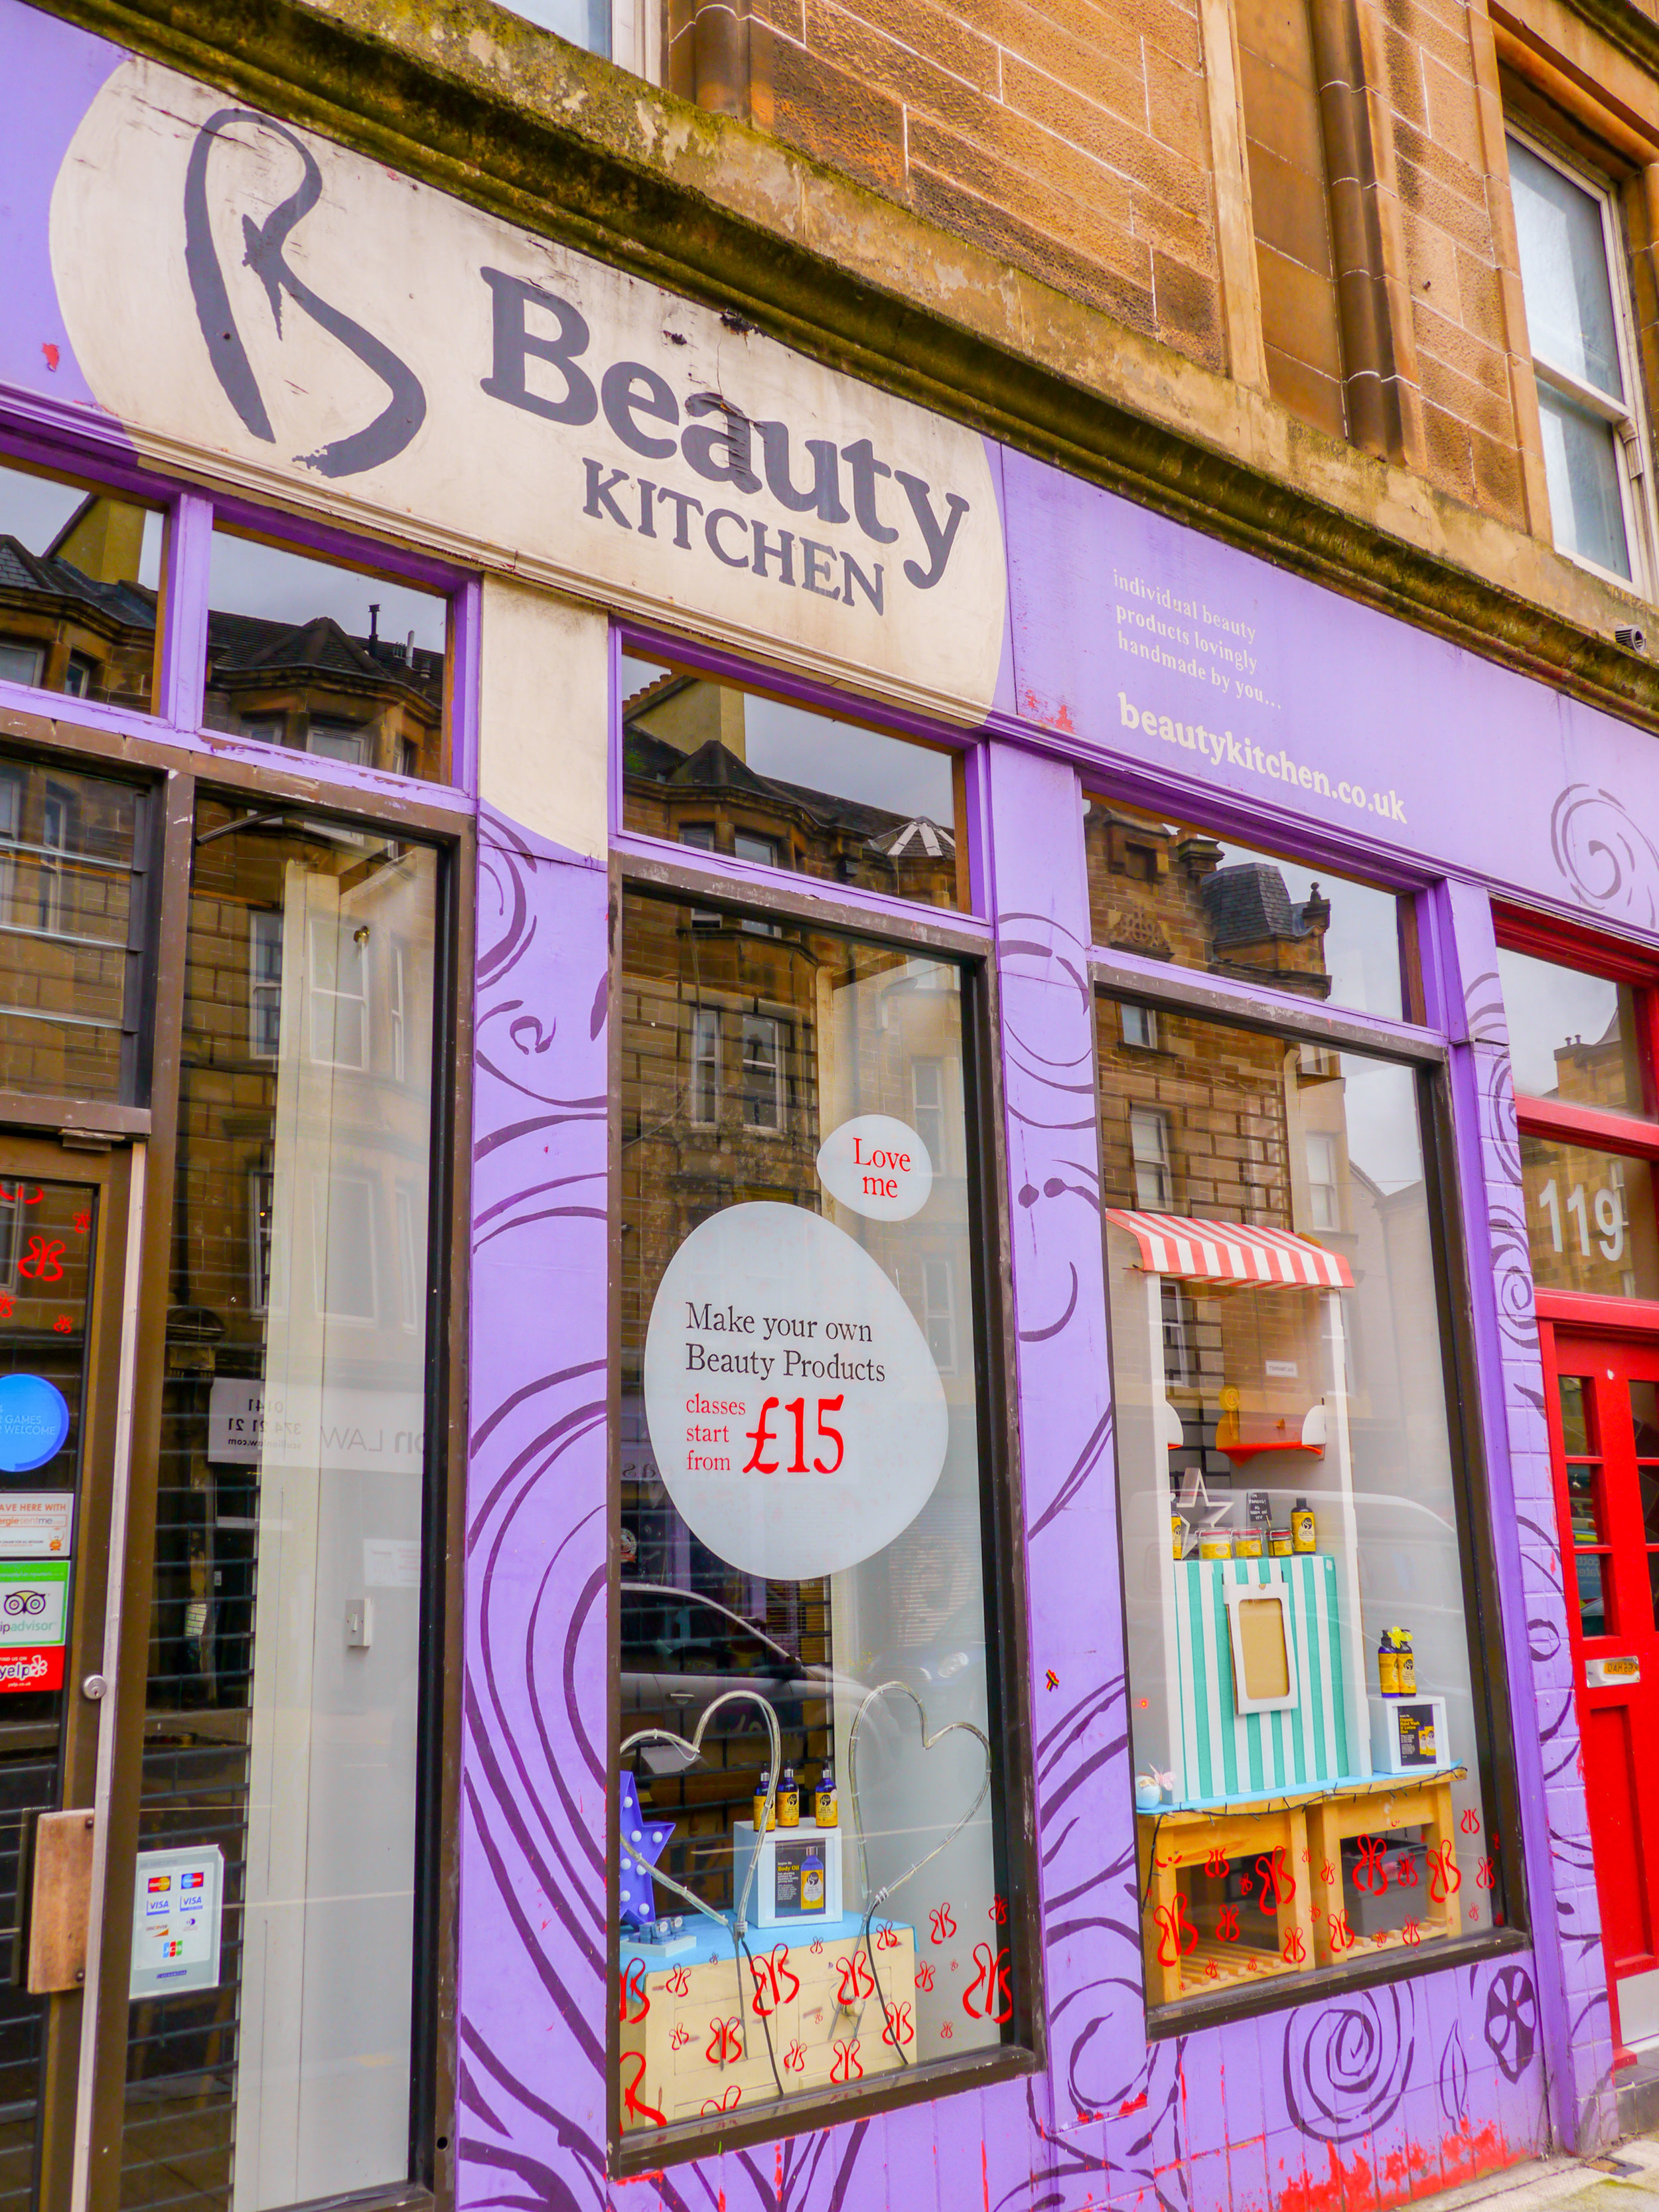 The Beauty Kitchen Glasgow. Photo by Johanna Read TravelEater.net